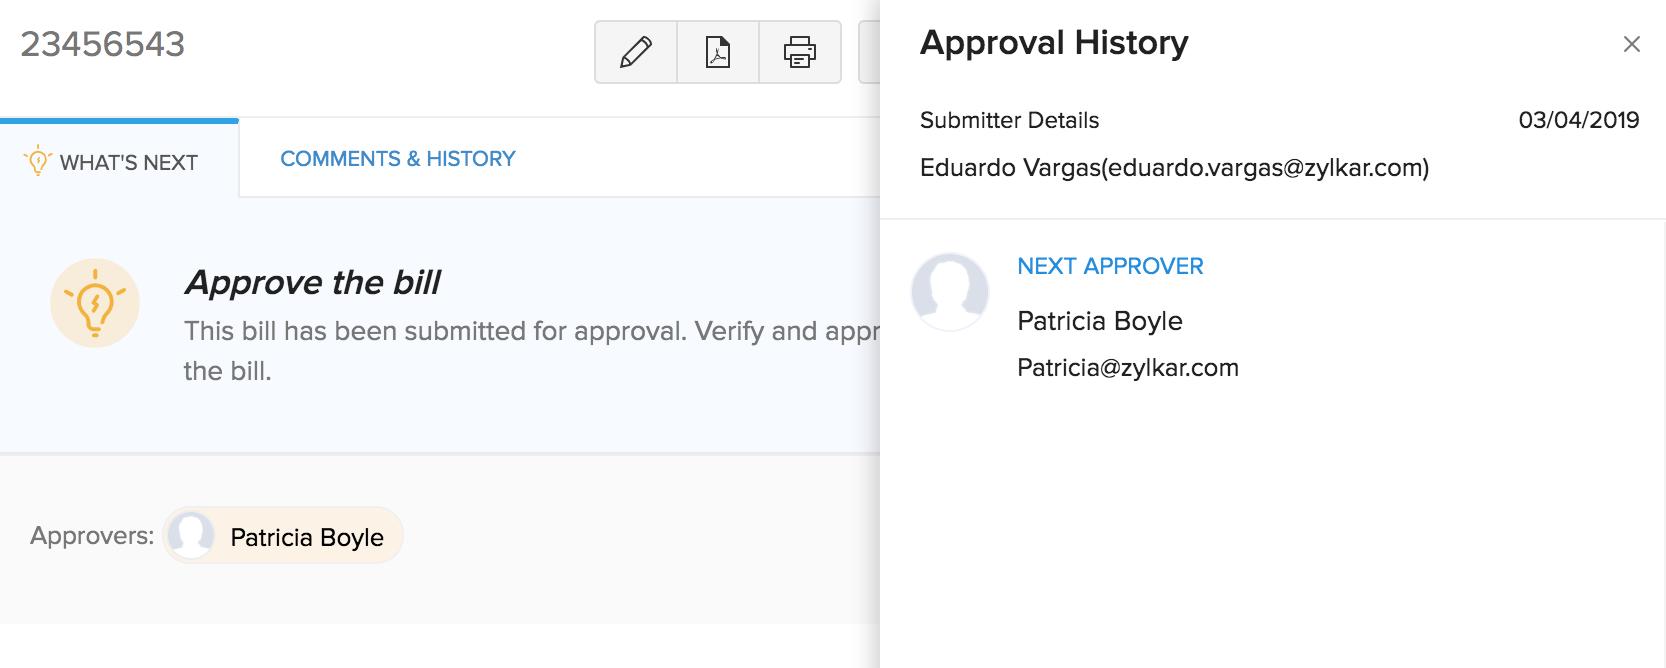 Transaction Approval